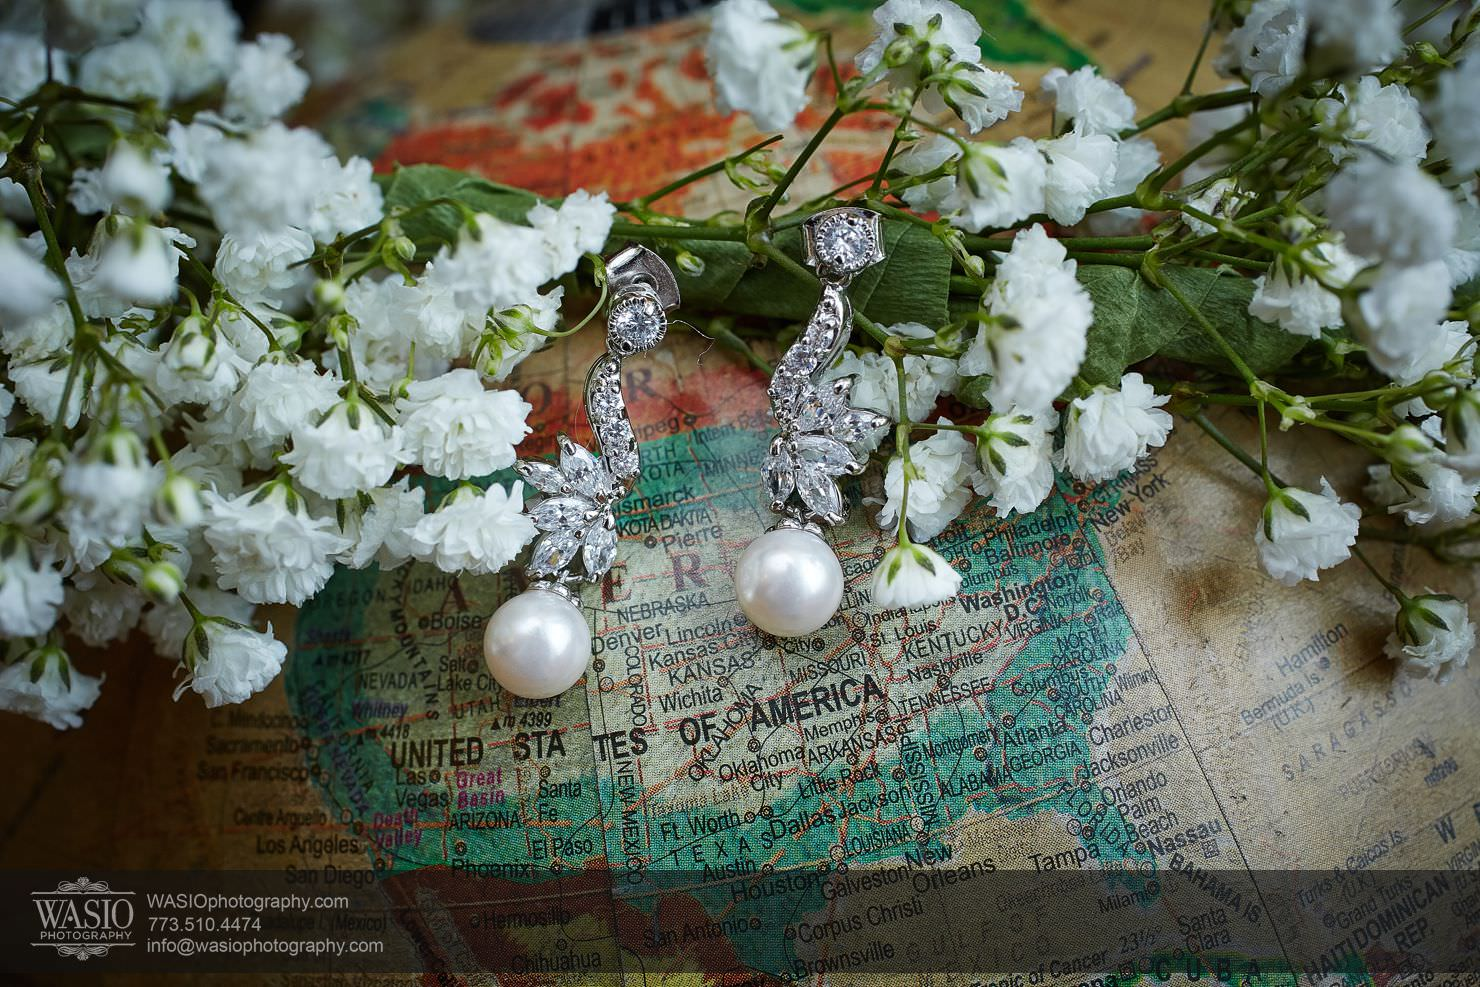 Rosemont-Fall-Wedding-Lauren-and-David-007 Rosemont Fall Wedding - Lauren + David